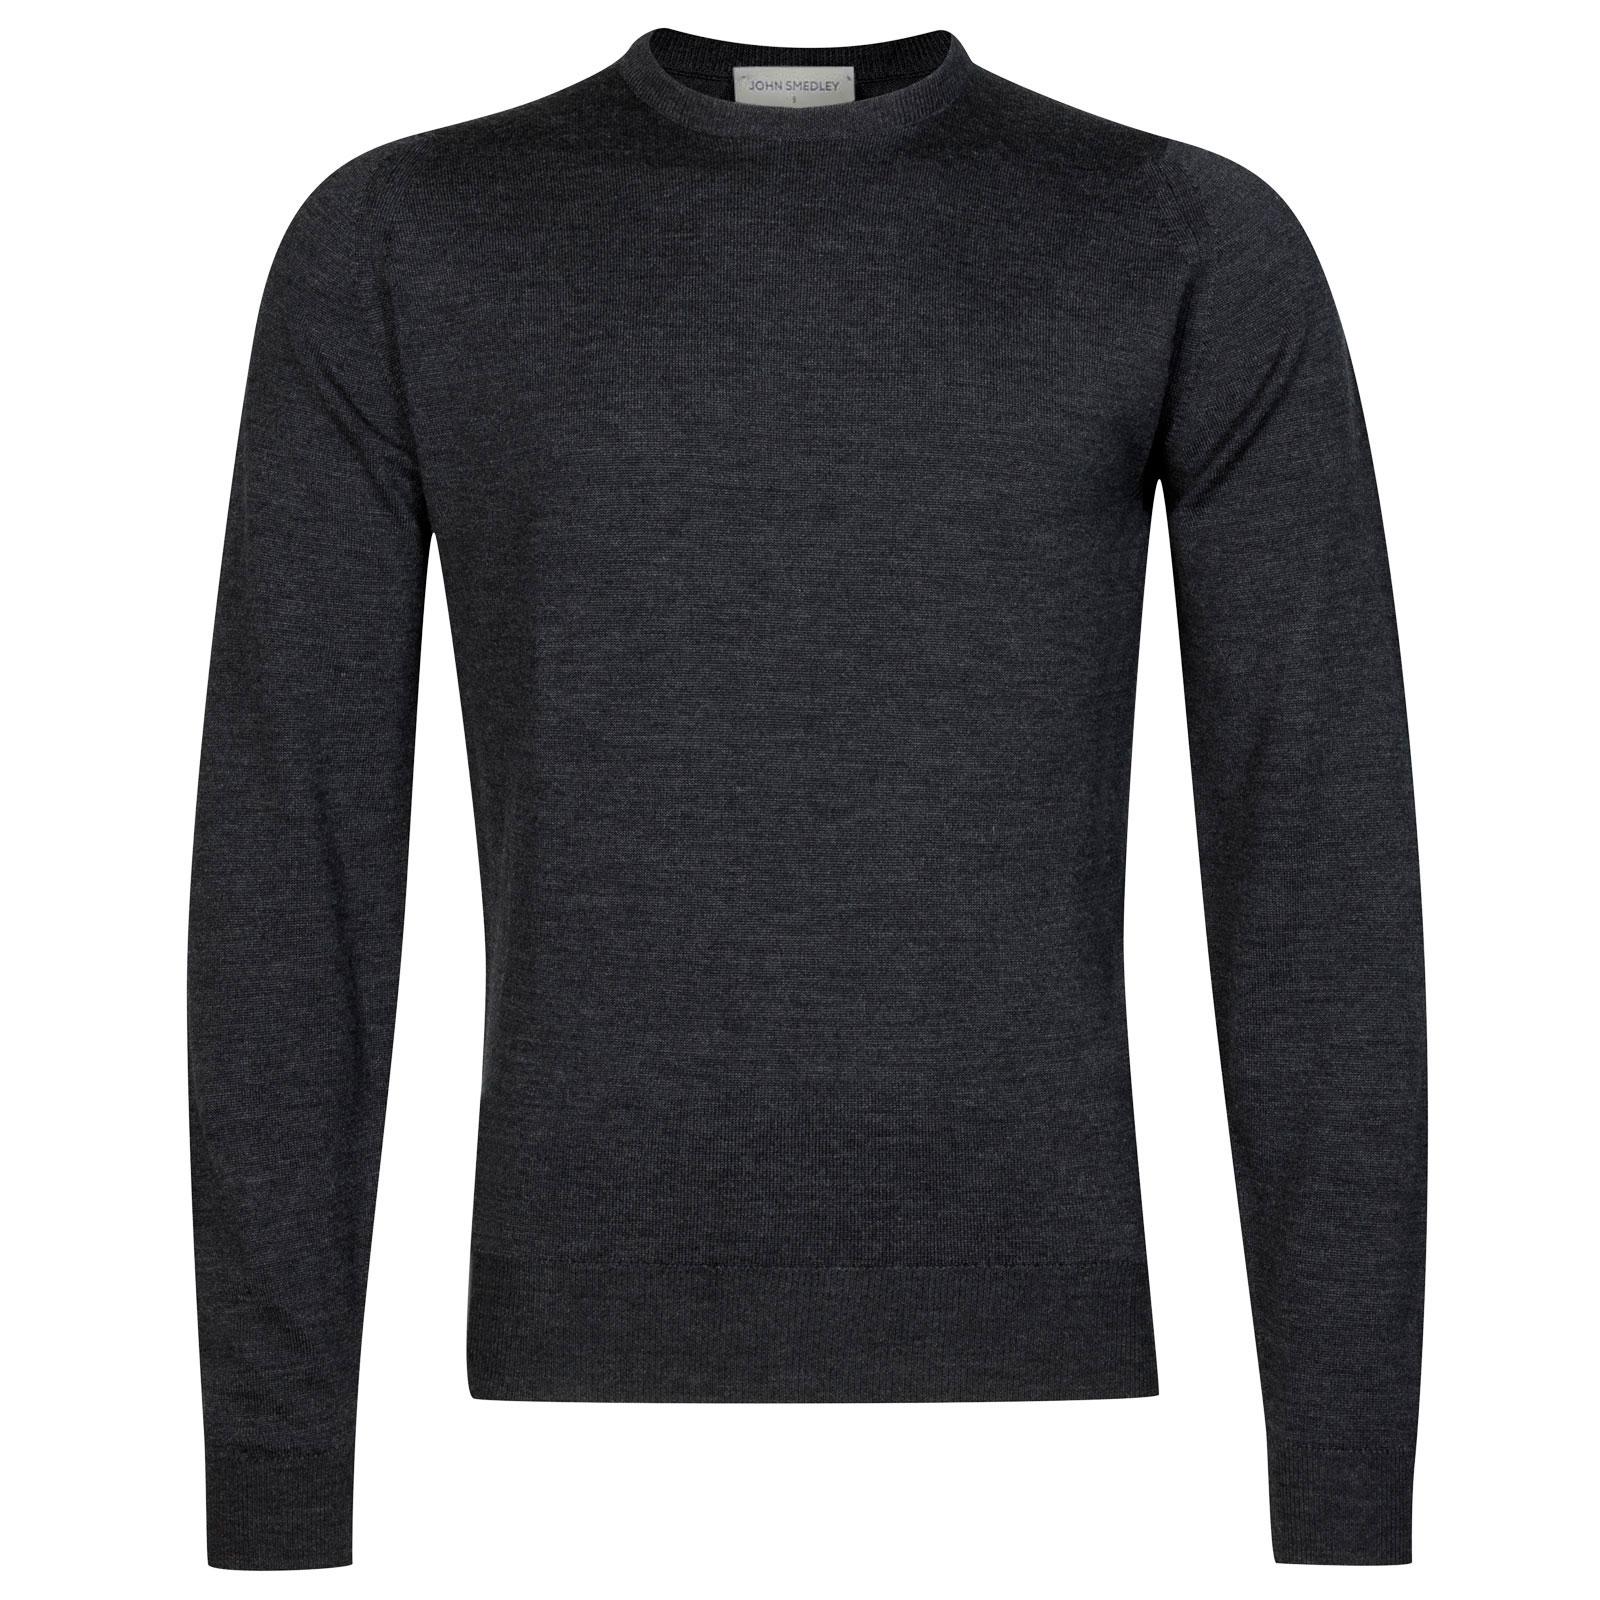 John Smedley Farhill Merino Wool Pullover in Charcoal-M